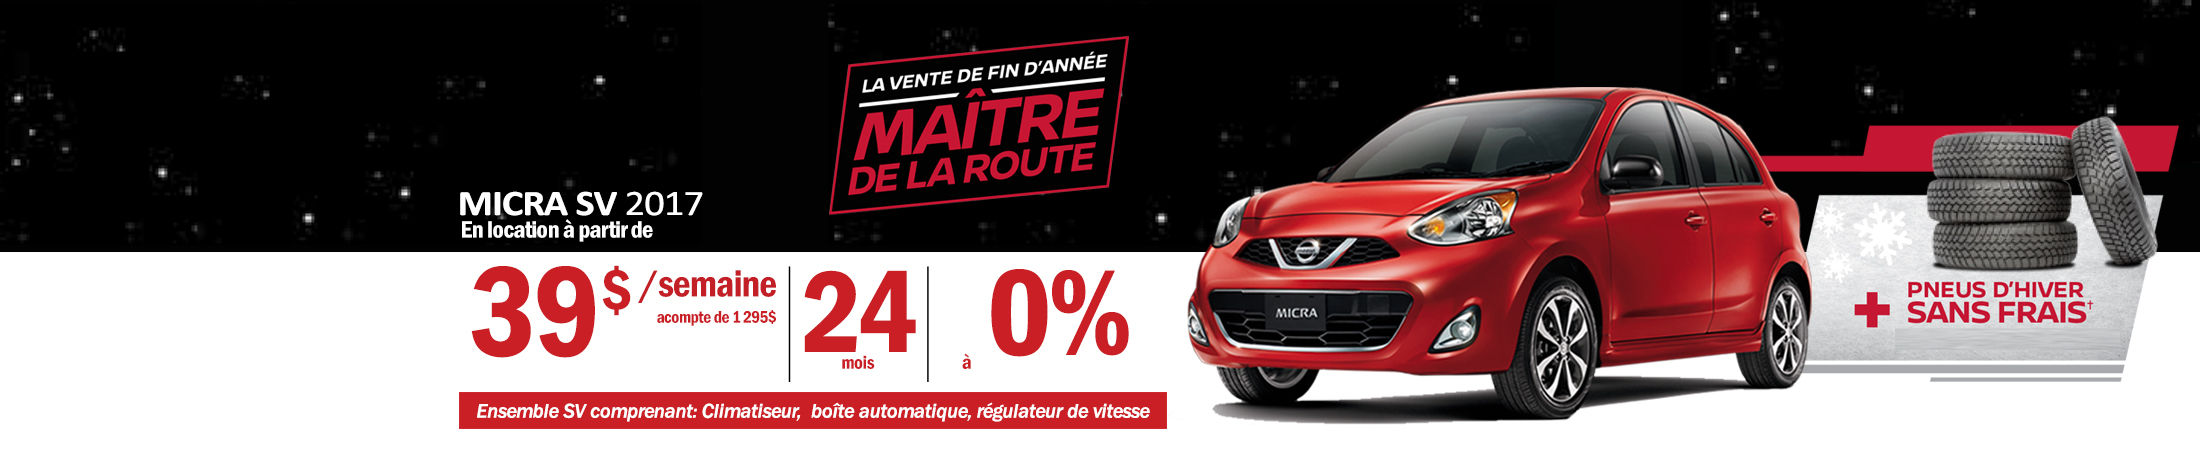 Nissan Micra Promotion novembre - Banner